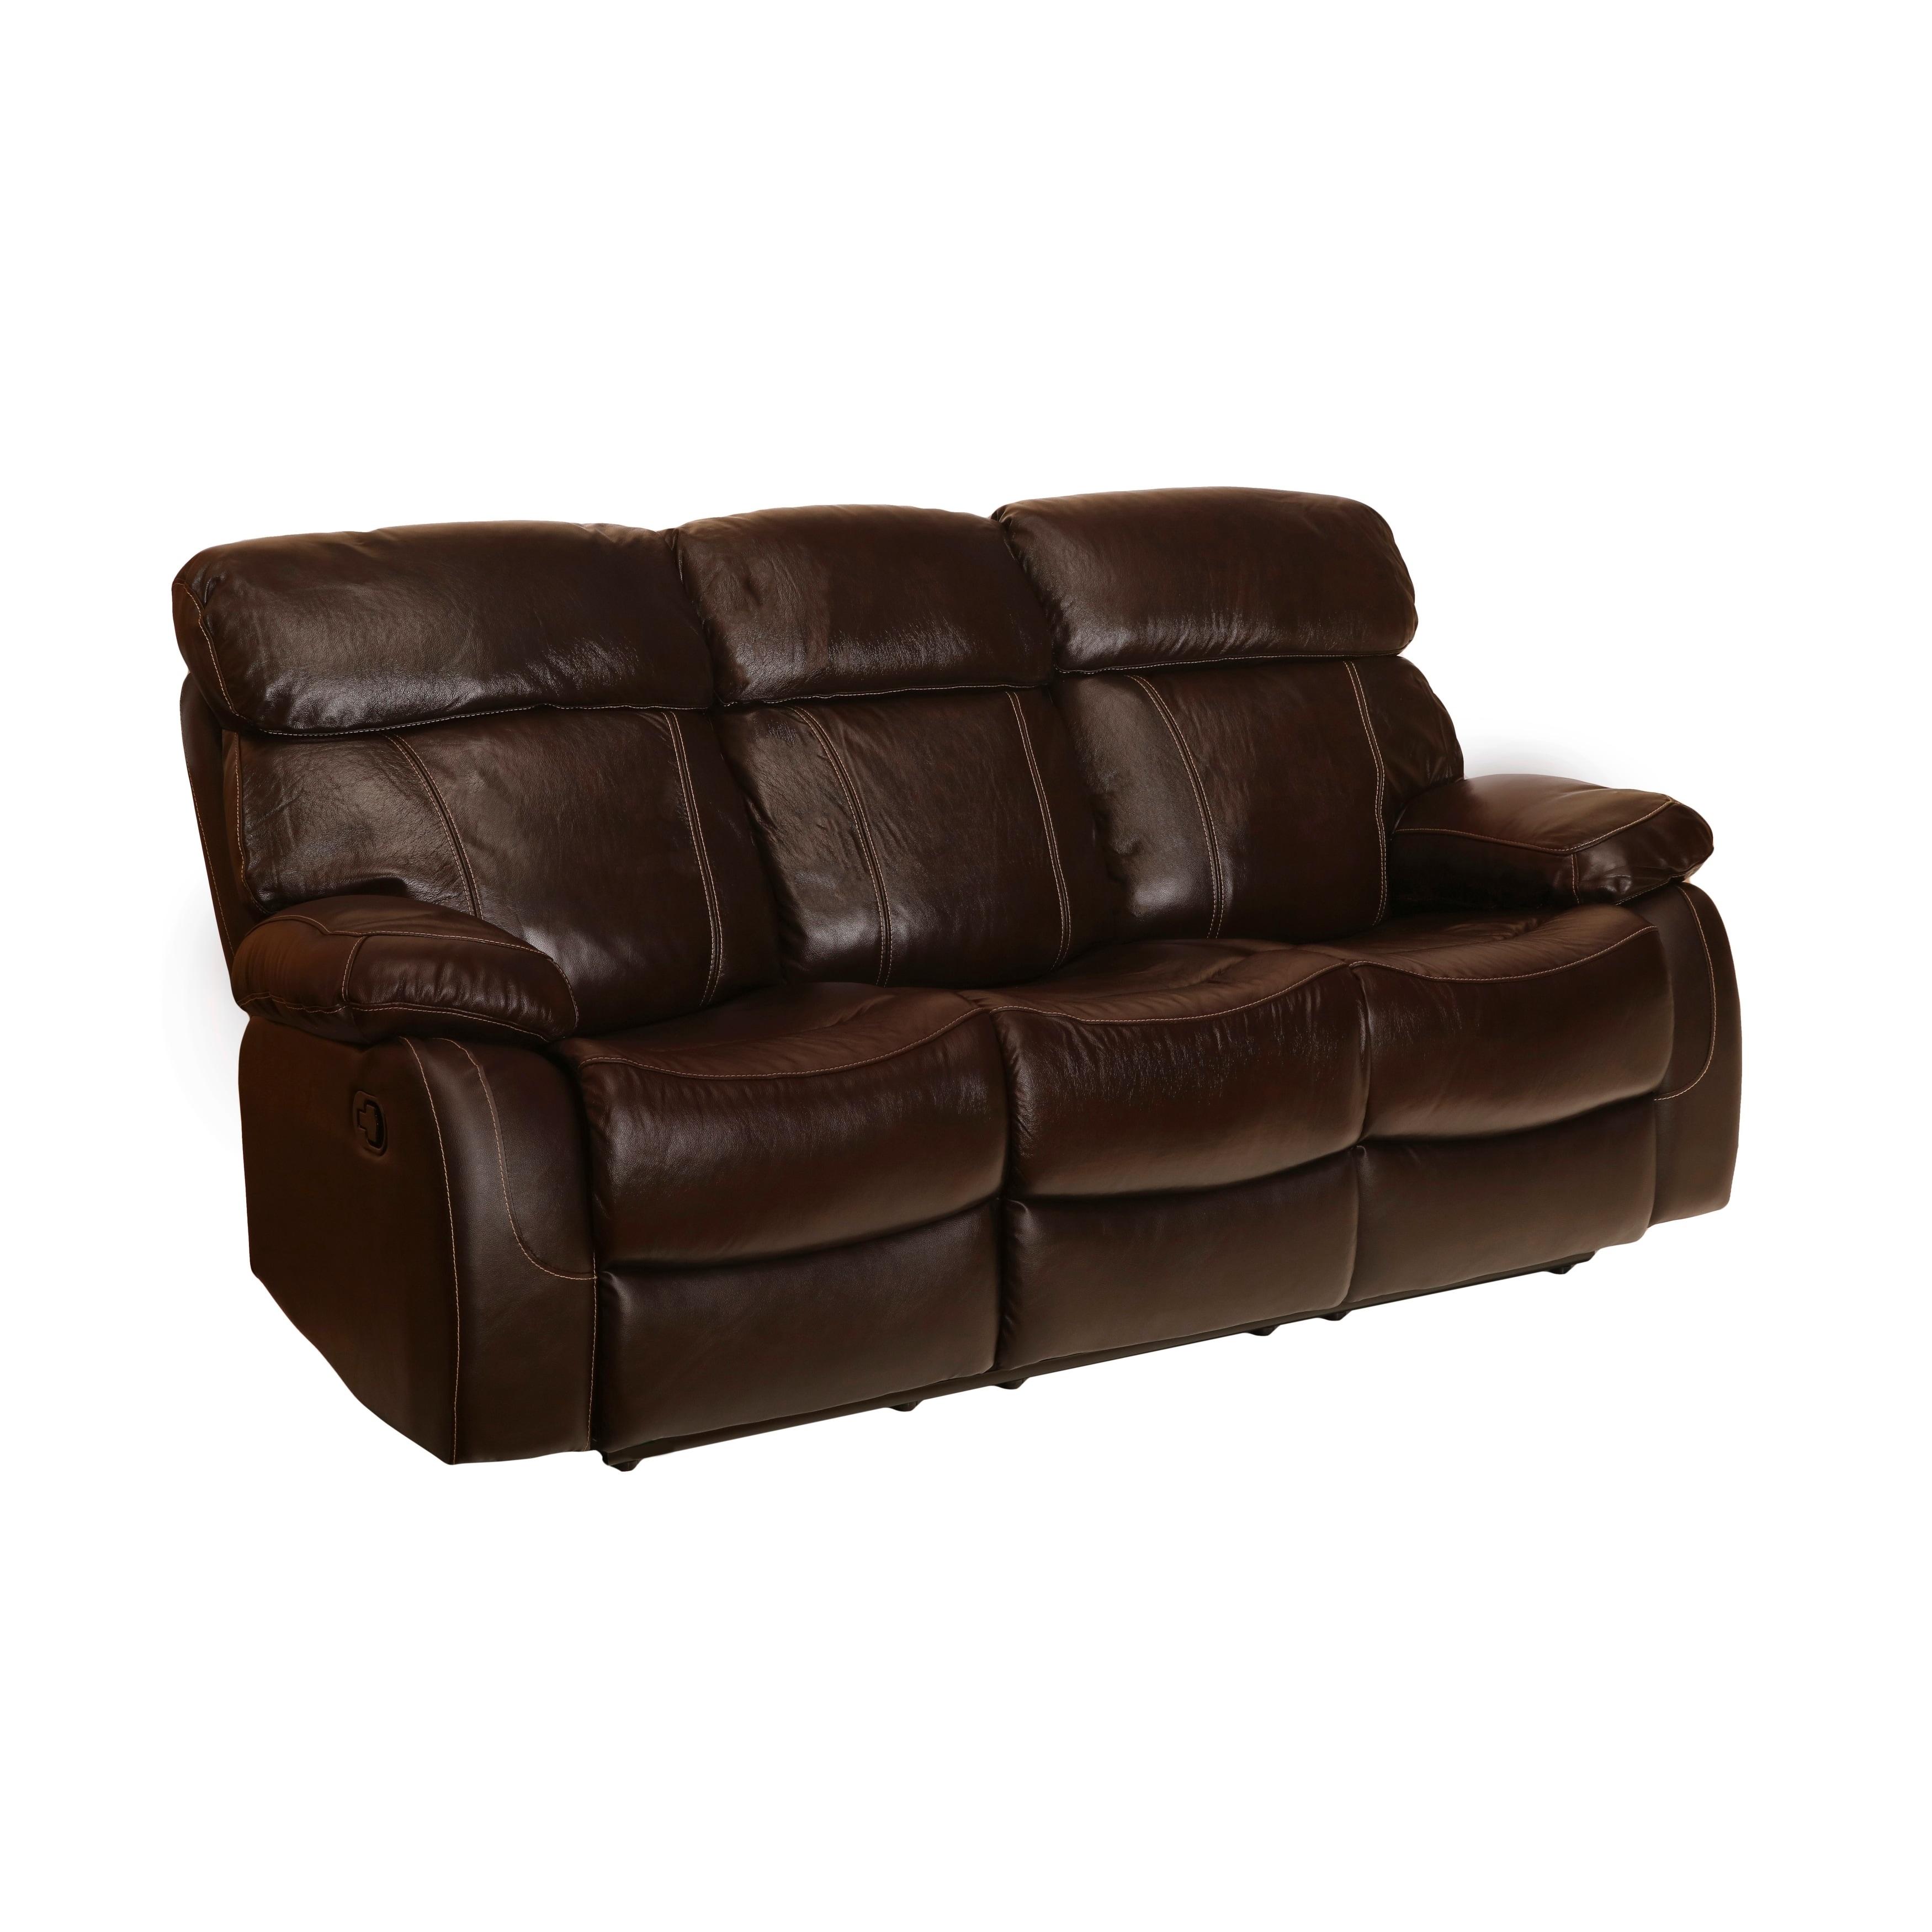 Coleman Top Grain Leather Reclining Sofa (Manual/Power) (Manual Recline)